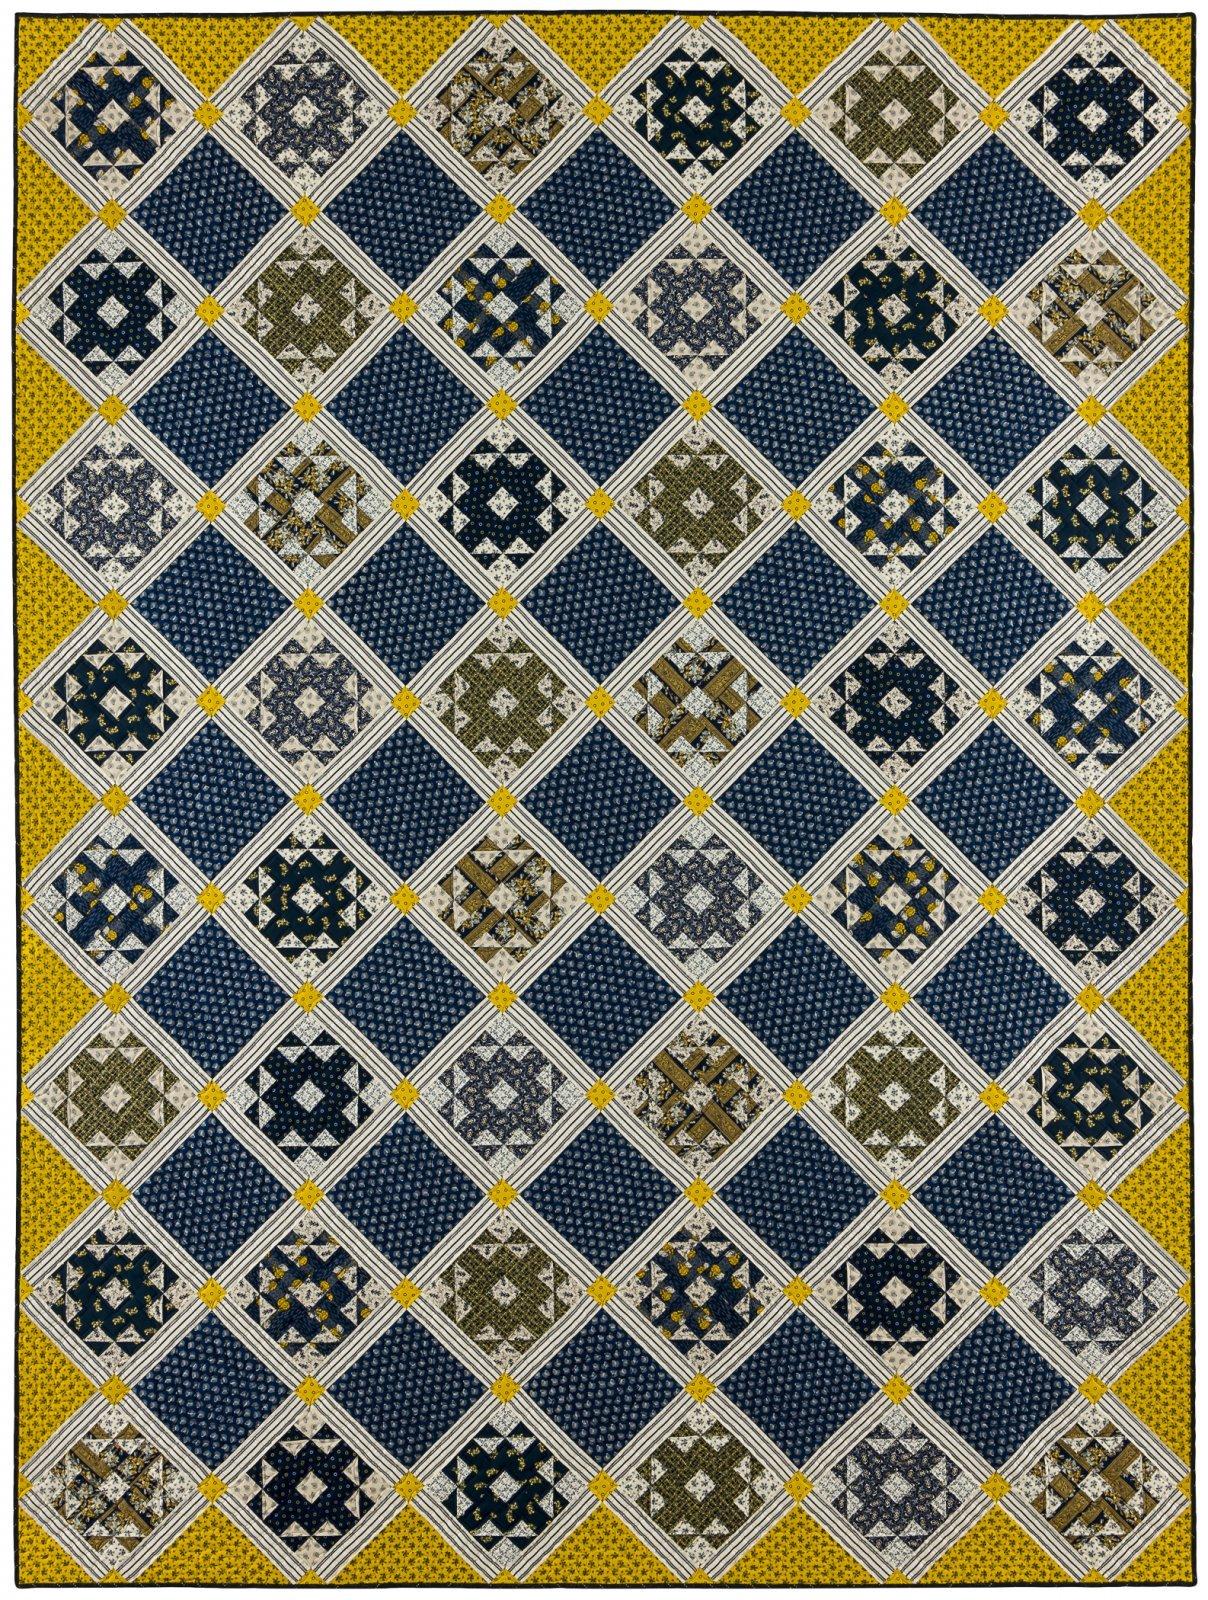 Laura's Quilt Pattern